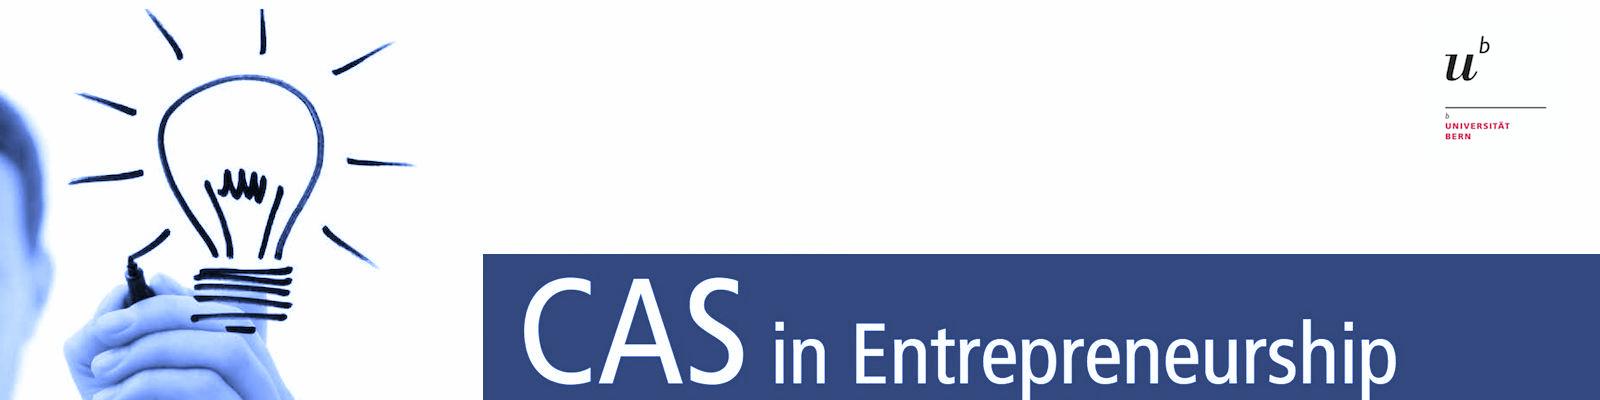 cas-entrepreneurship-titel